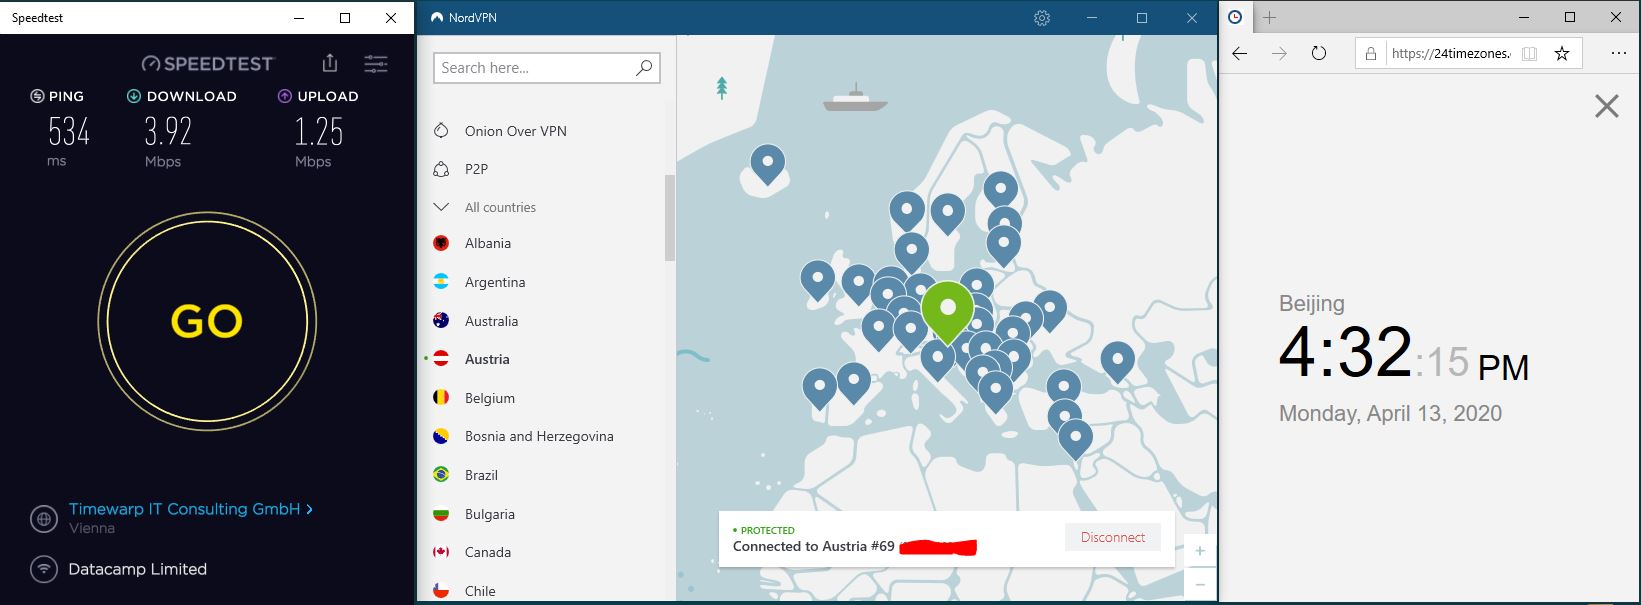 Windows10 NordVPN Austria #69 中国VPN 翻墙 科学上网 SpeedTest测速-20200413